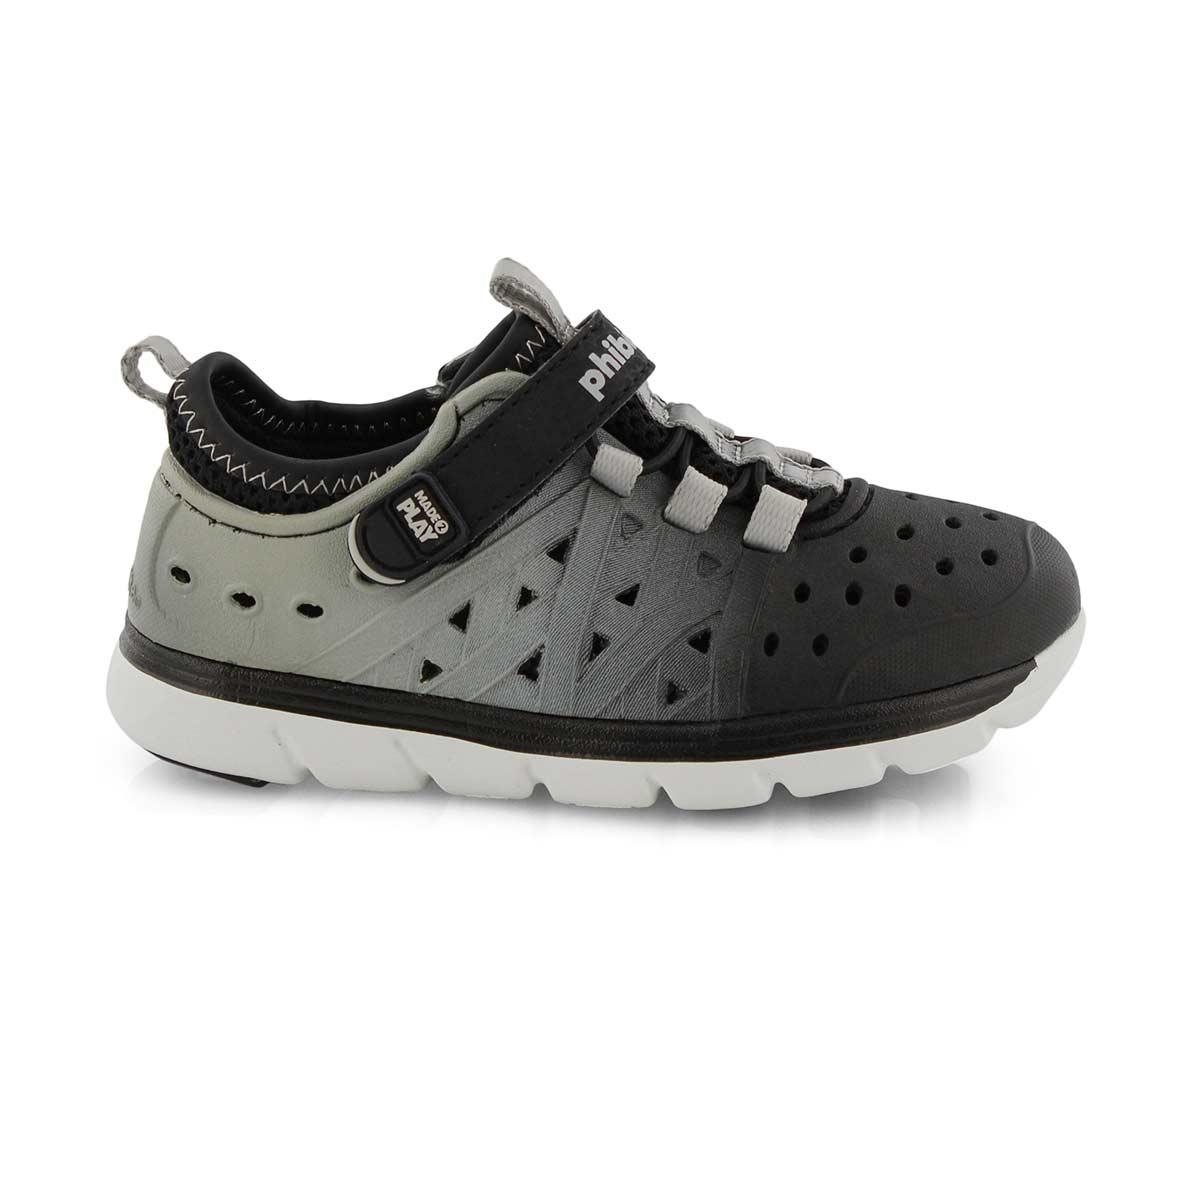 Bys M2P Phibian black/grey sneaker